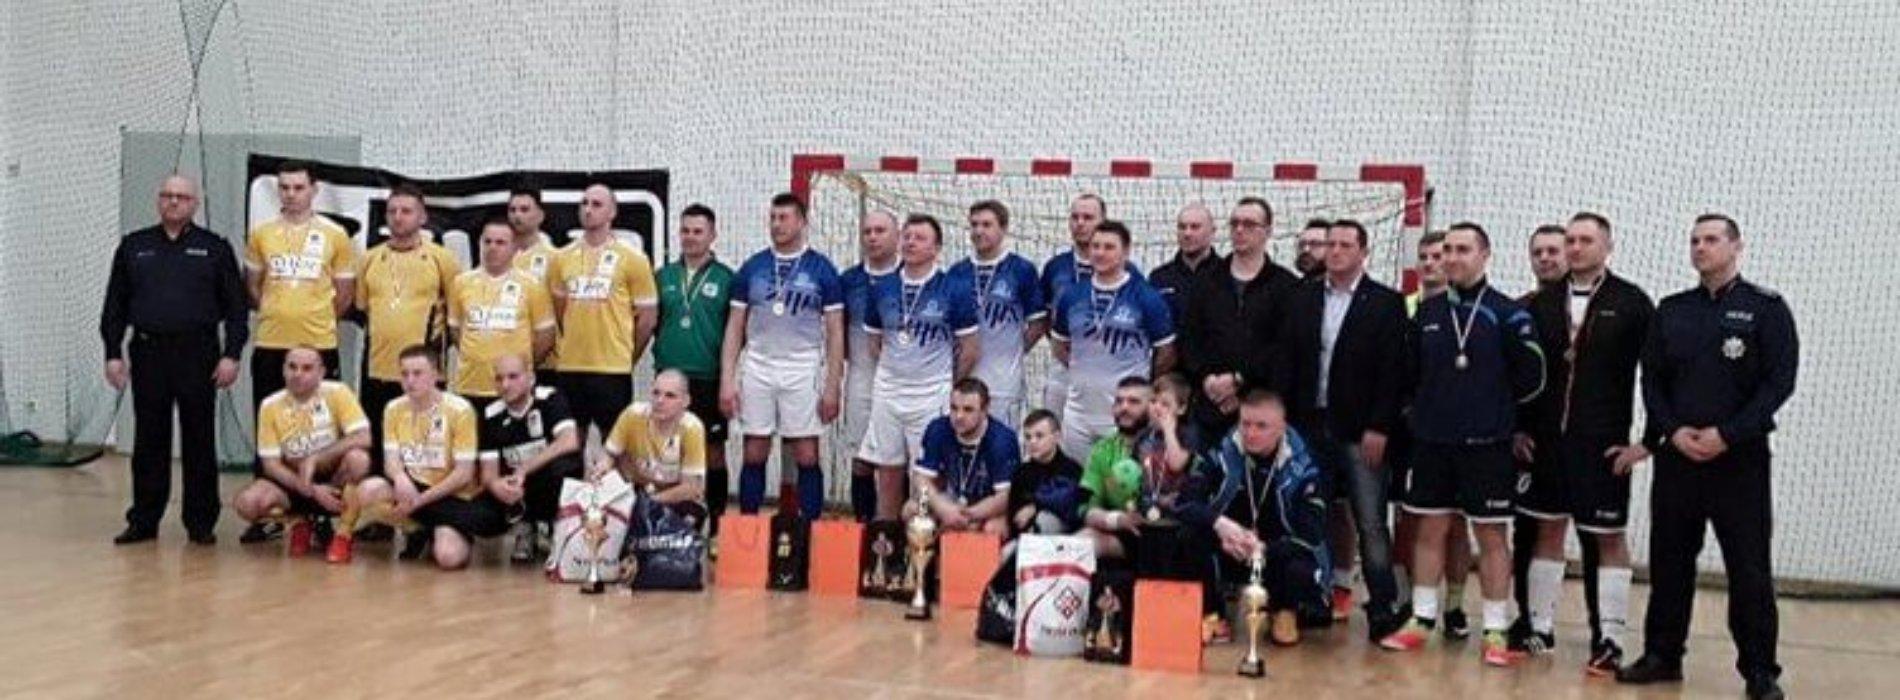 KMP ŁÓDŹ FUTSAL CUP 2017 JUŻ ZA NAMI